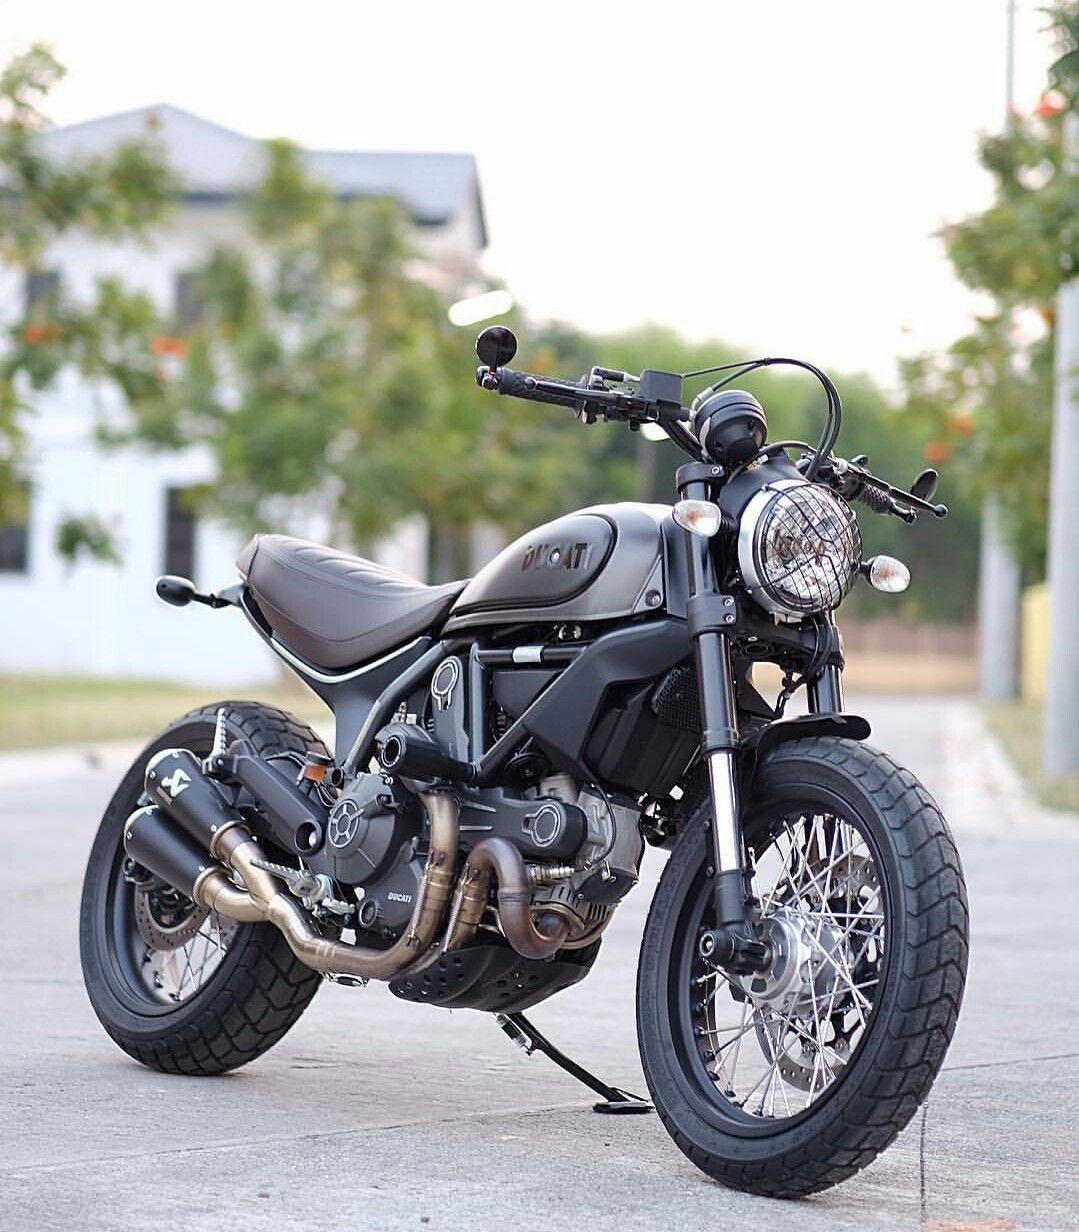 Épinglé Par Danny Marc SAM MING Sur Ducati Scrambler En